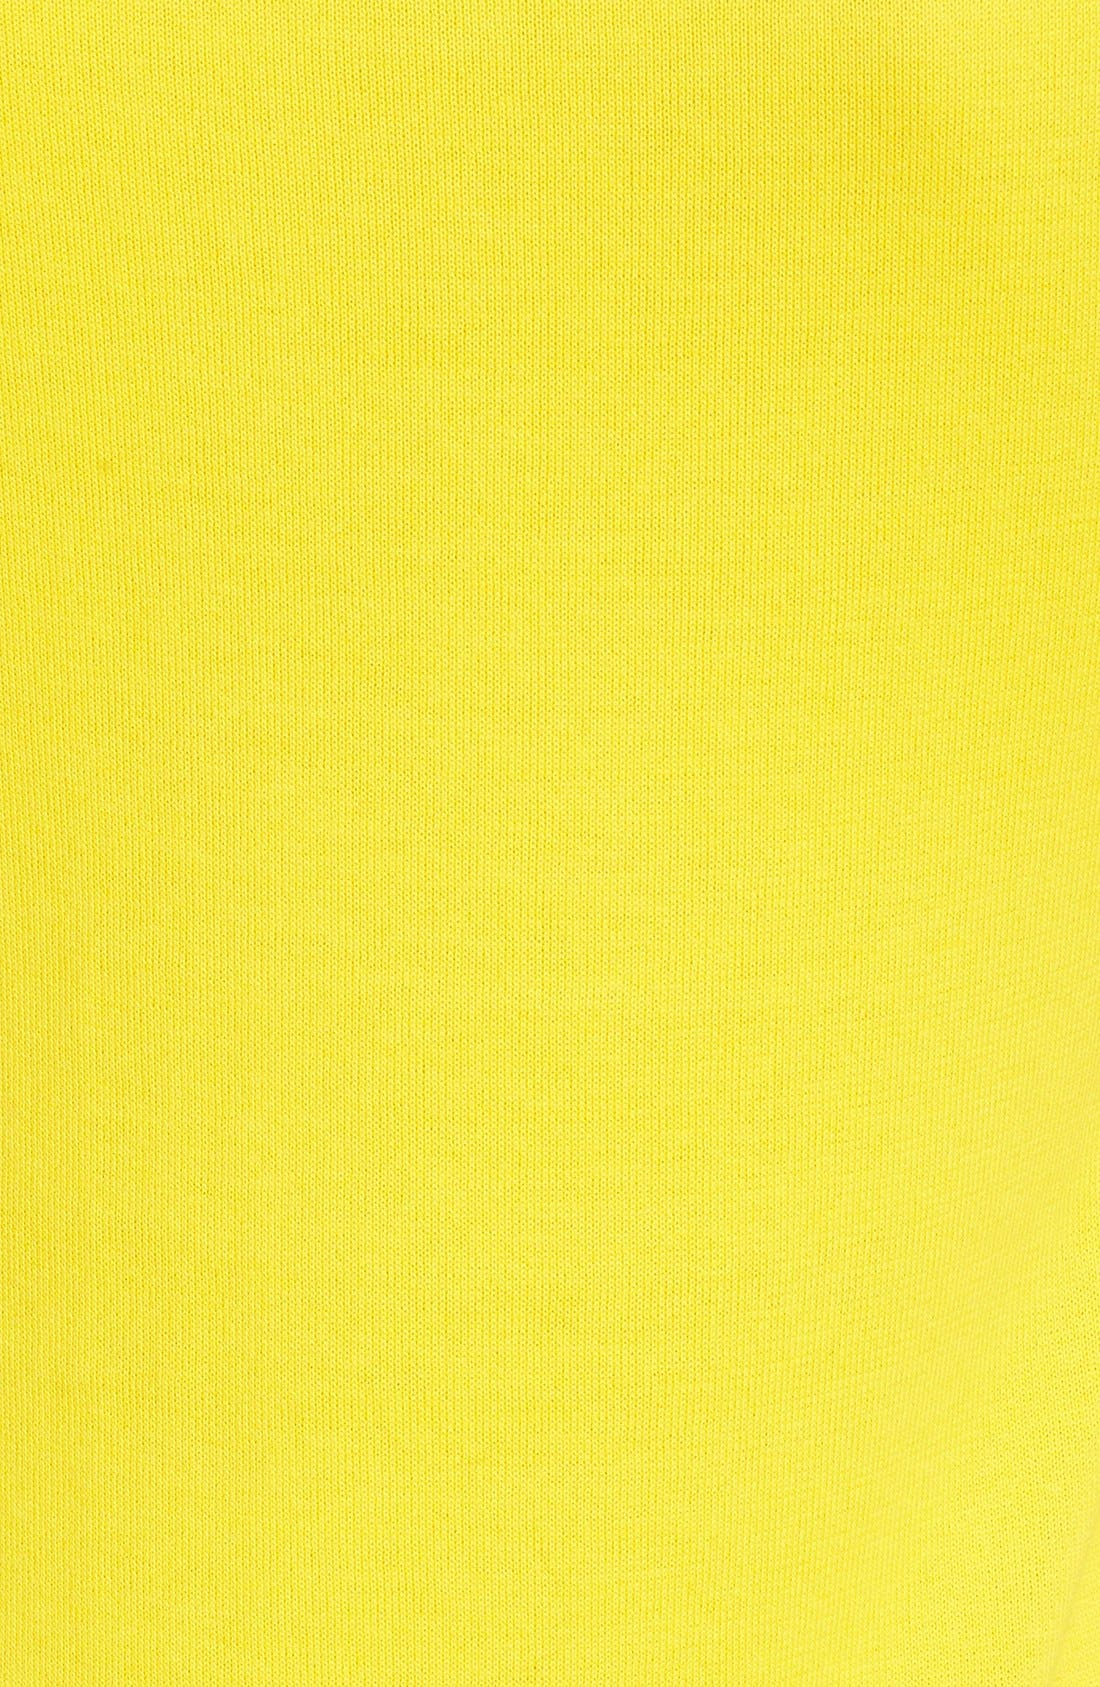 Alternate Image 3  - Moschino 'The Powerpuff Girls® - Buttercup' Intarsia Knit Dress